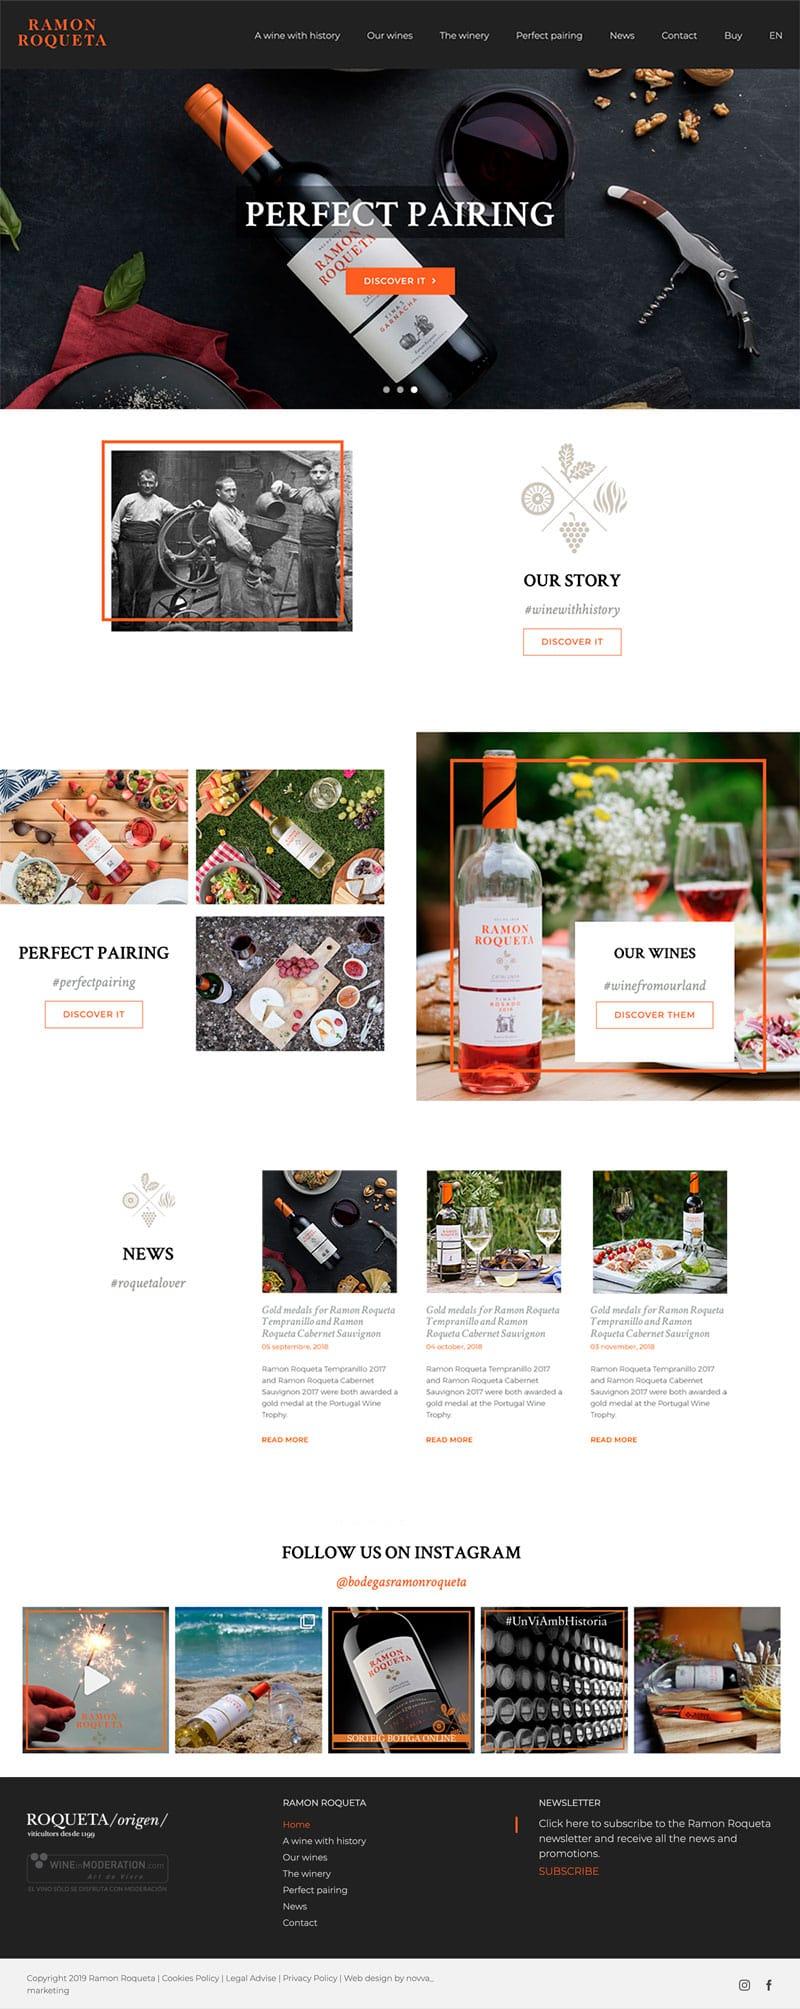 interface-web-design-ramonroqueta